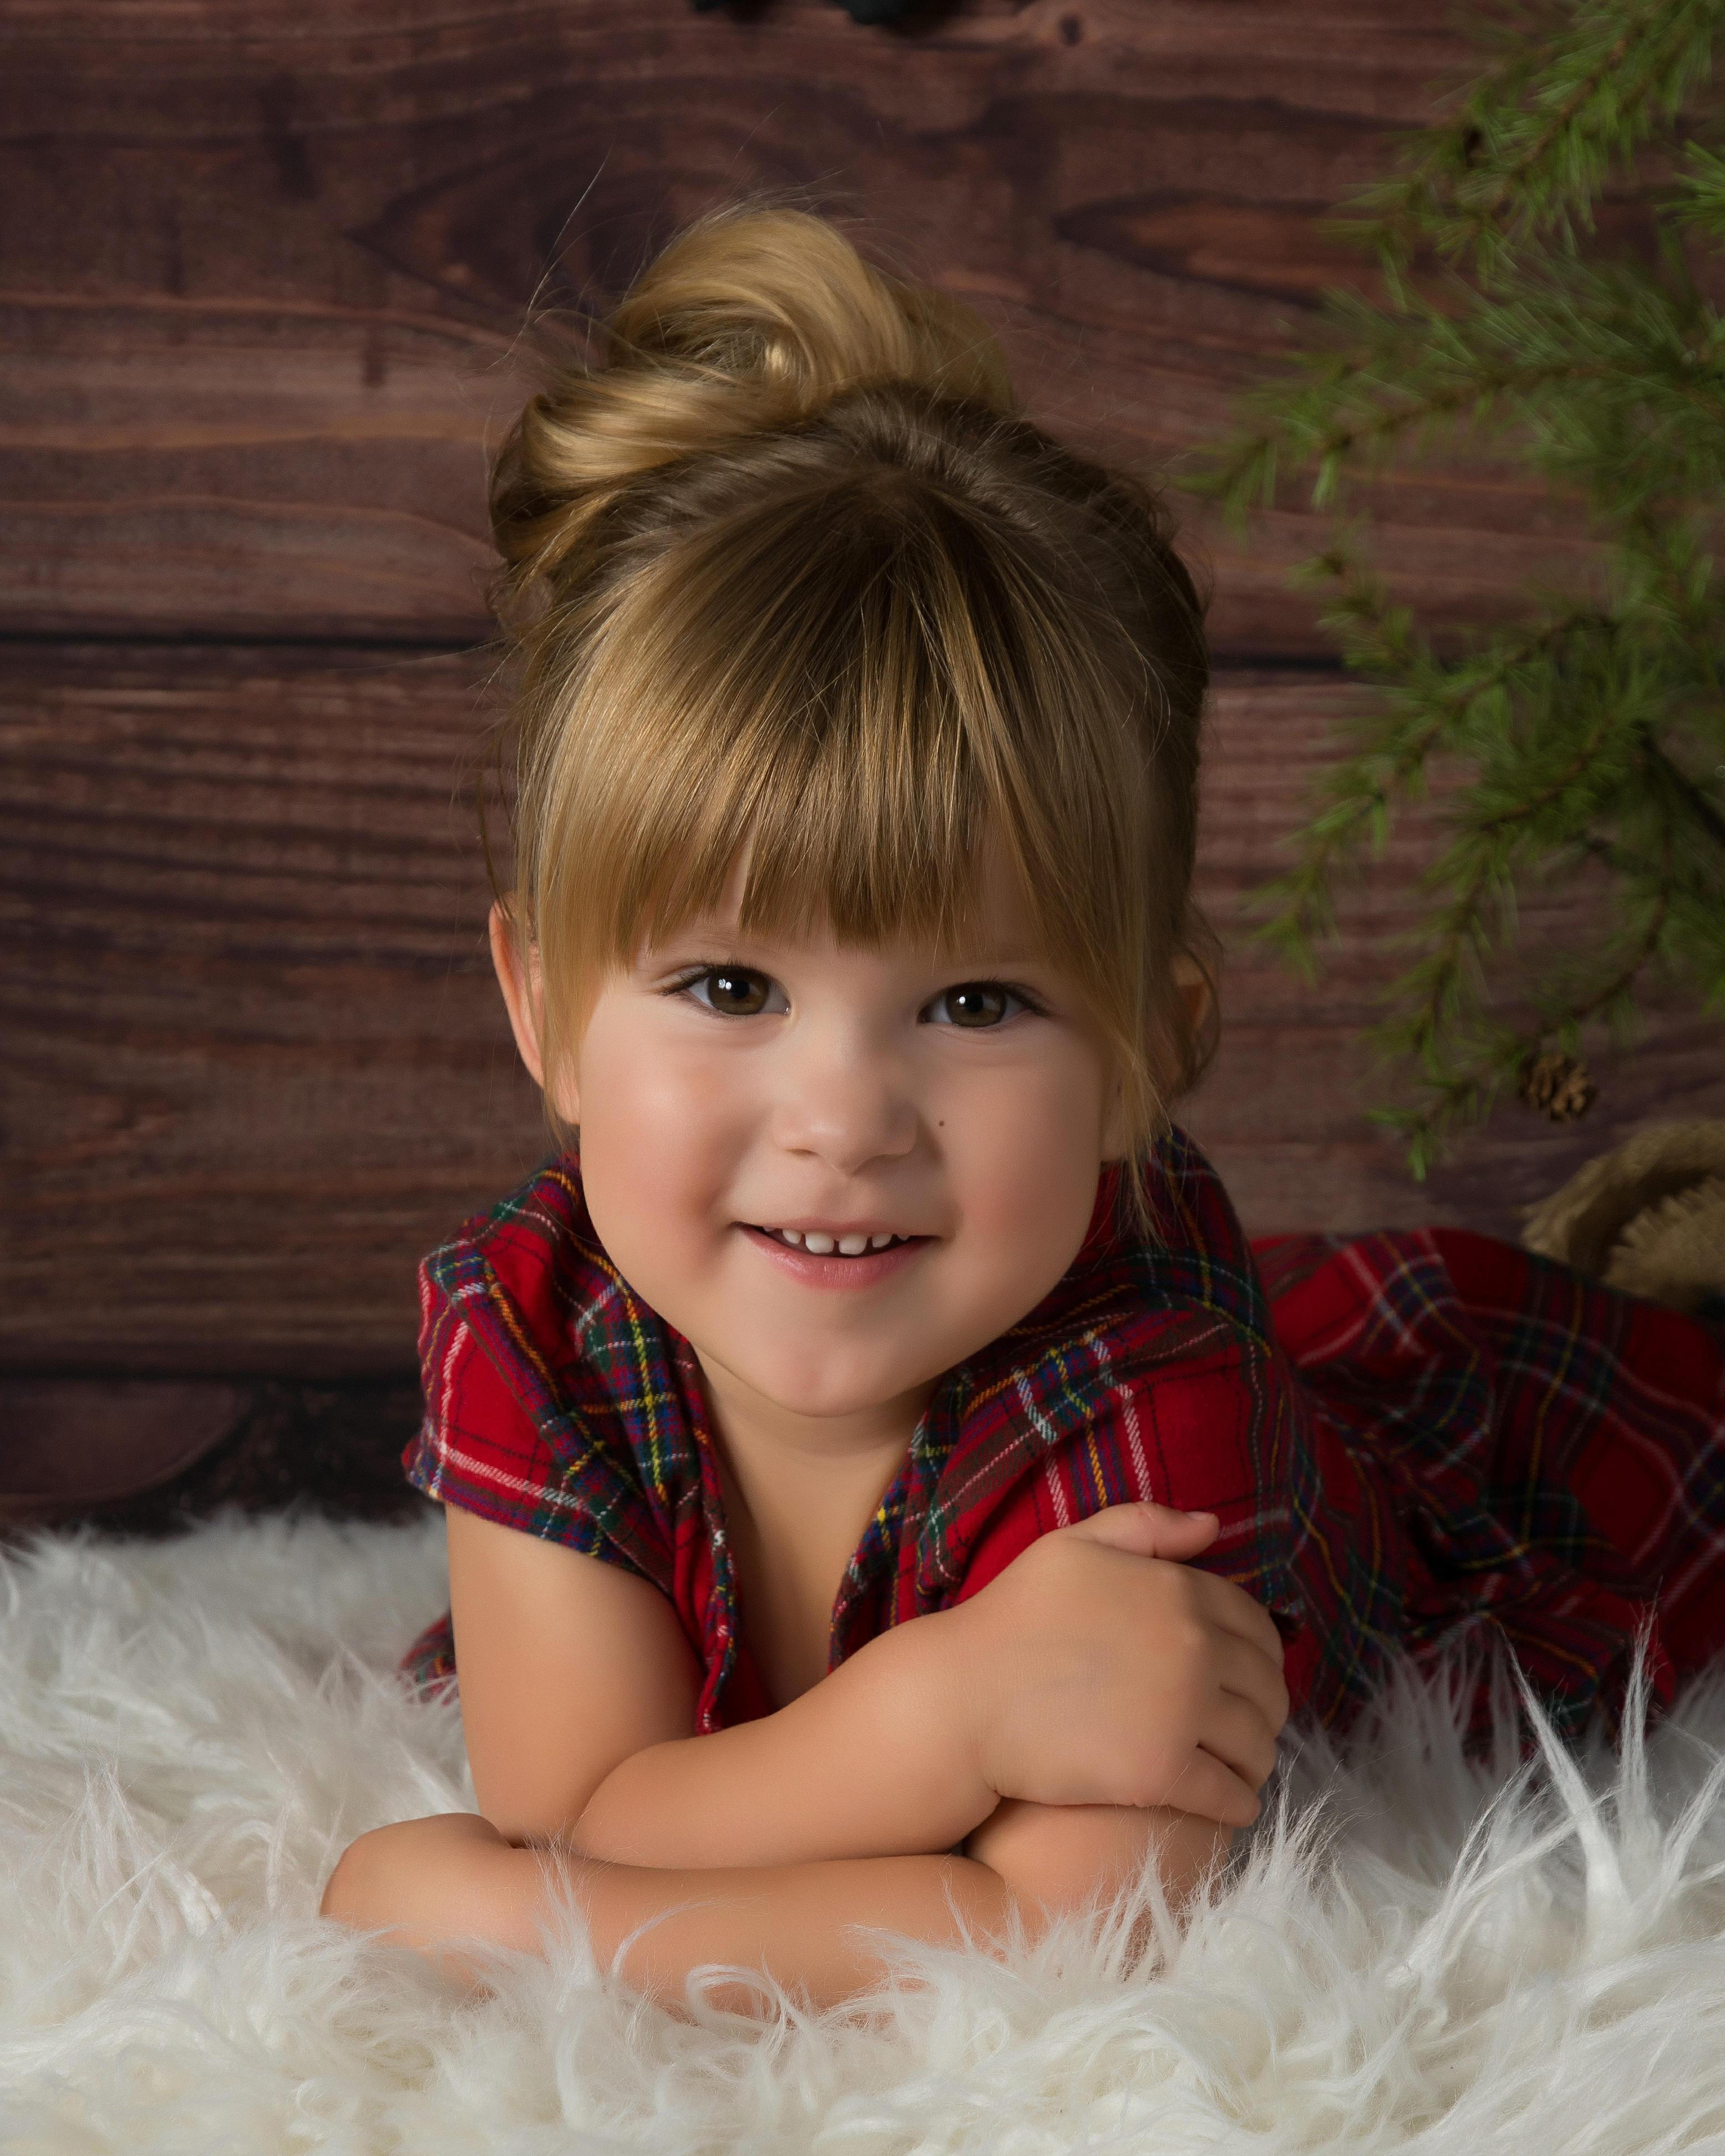 Lifetouch Preschool Photography - Sales Representative image 2